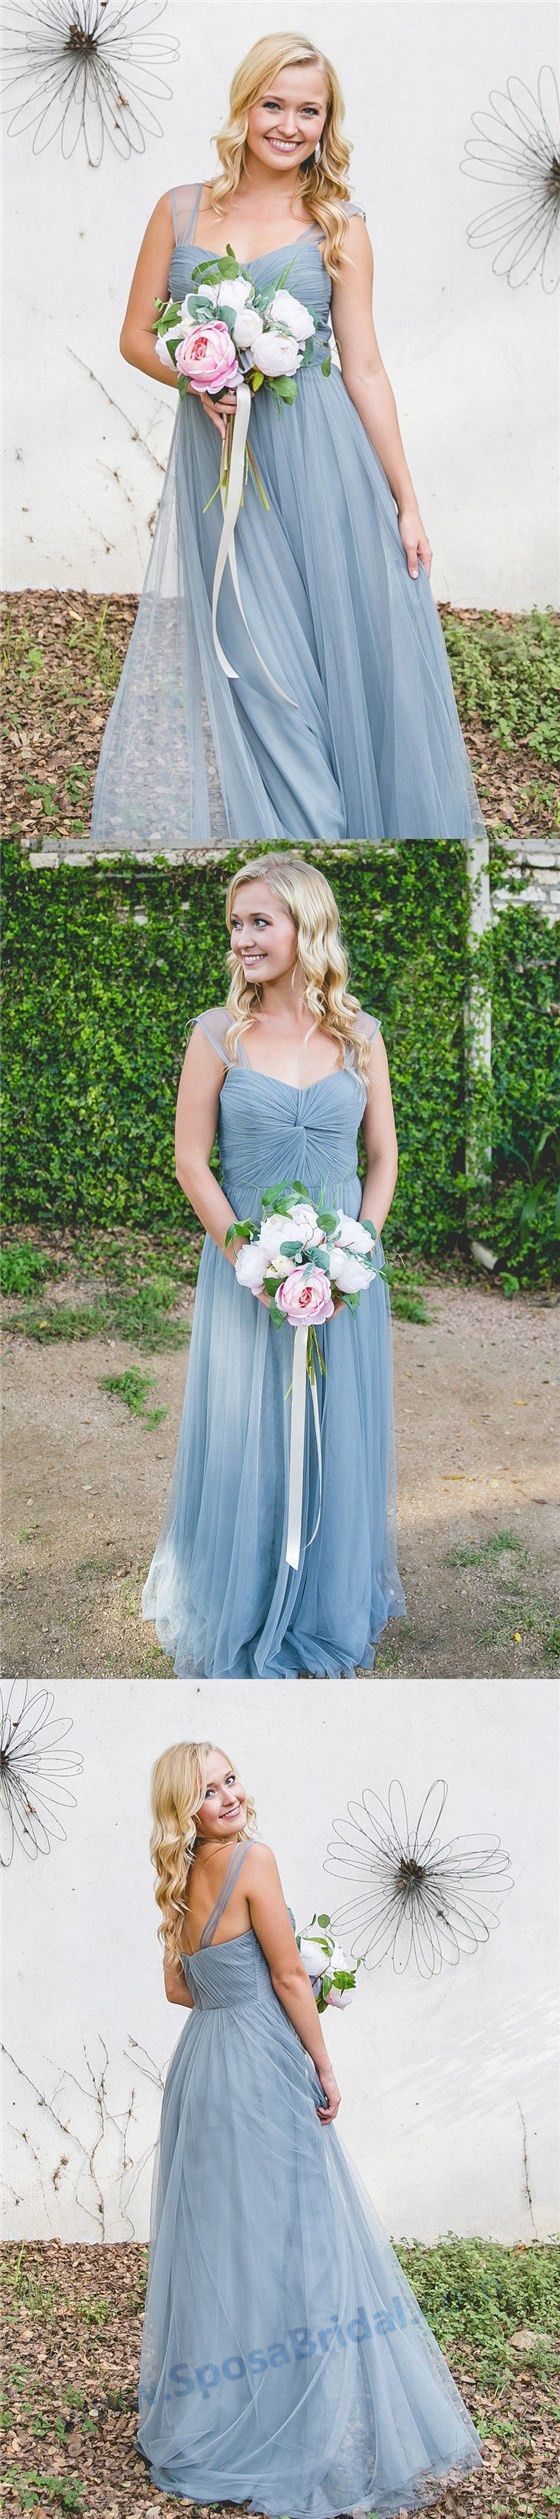 Cheap Custom Newest Pink Blue Tulle Bridesmaid Dresses, High Quality Handmade Bridesmaid Dress, PD0455 #sposabridal#bridesmaiddresses